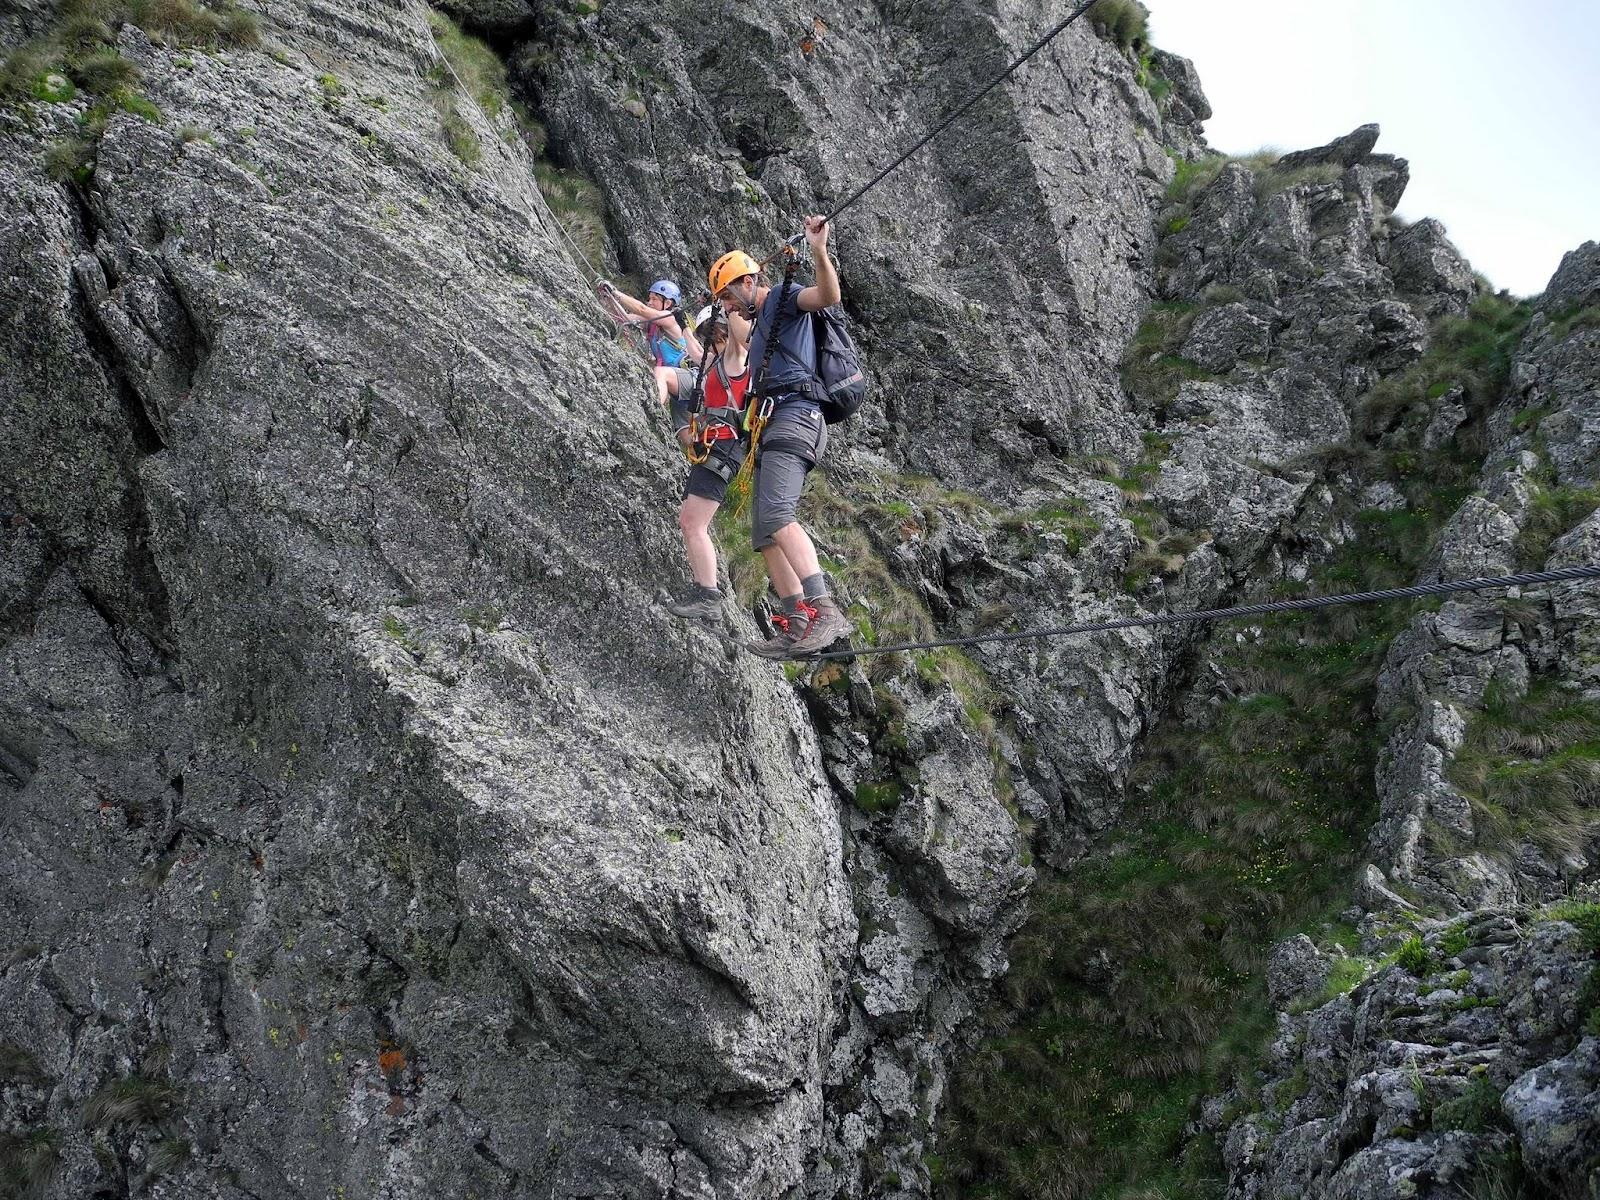 Klettersteig Falkert : Berghütte erlebnis hütte falkert patergassen firma